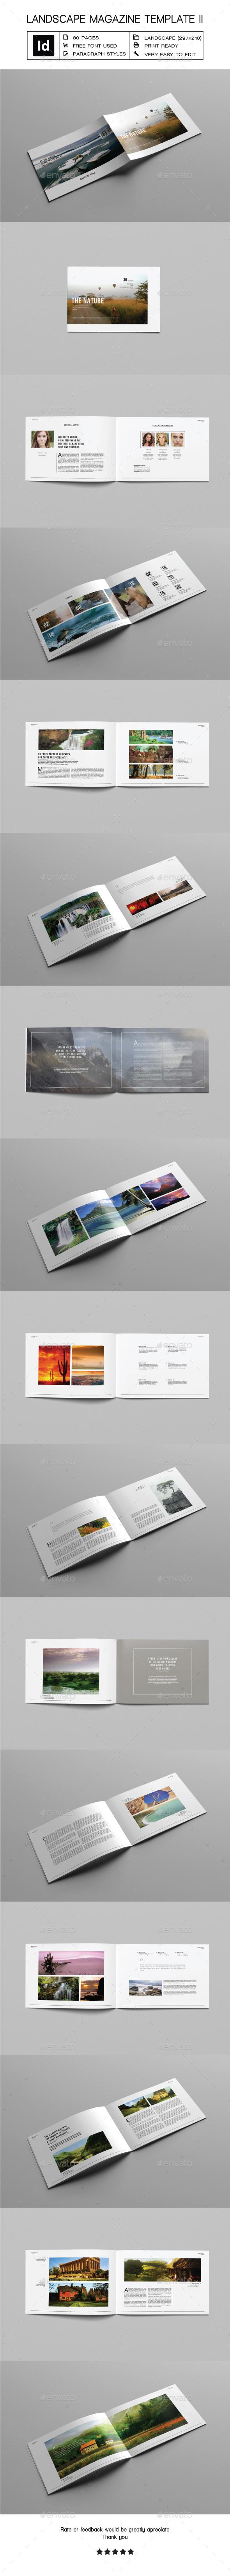 Landscape Magazine Template II - Magazines Print Templates